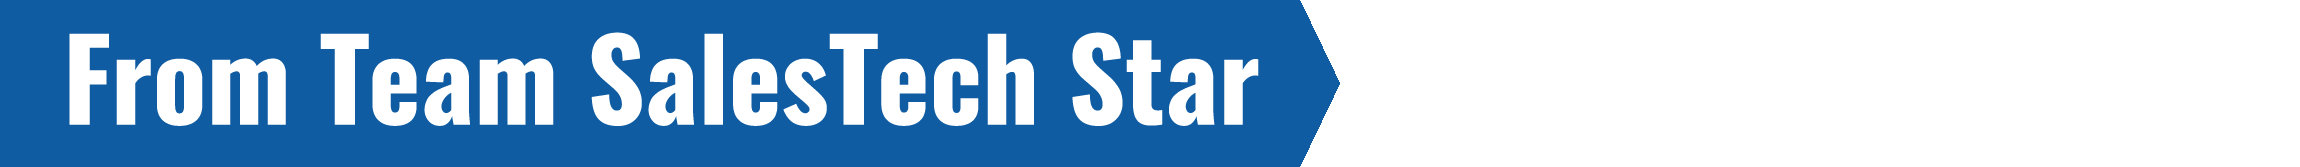 From team SalesTech Star